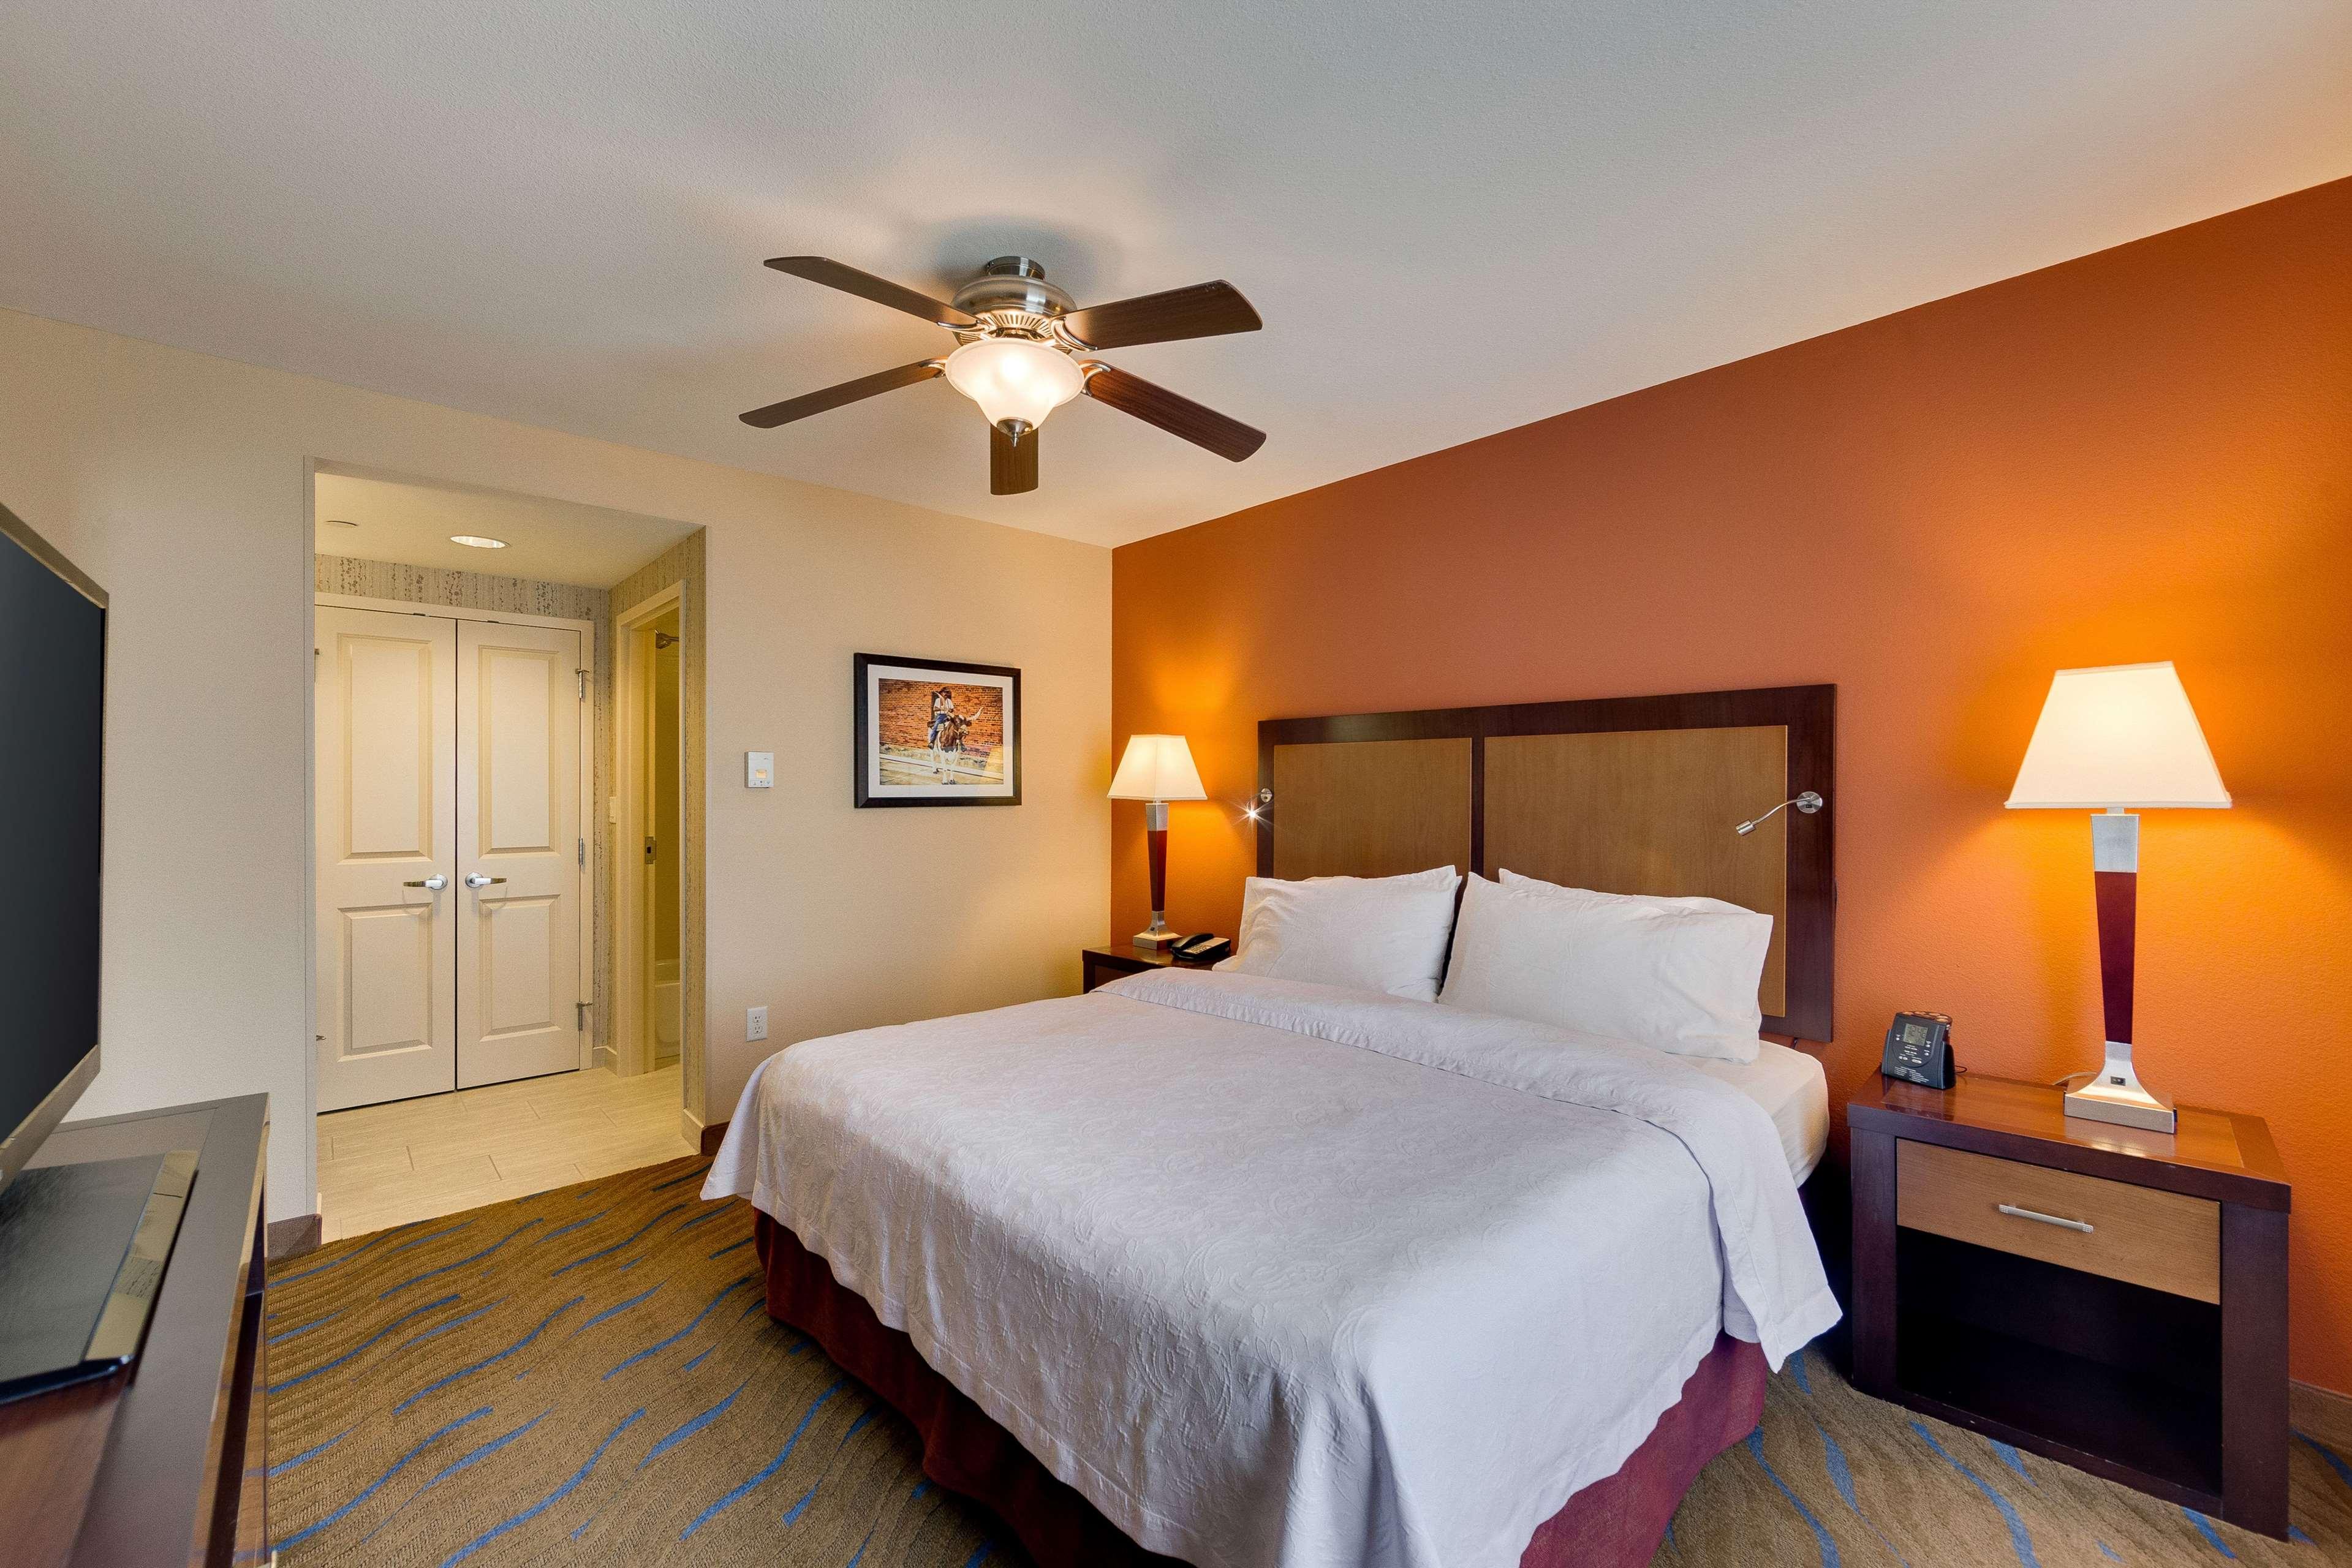 Homewood Suites by Hilton Fort Worth - Medical Center, TX image 21